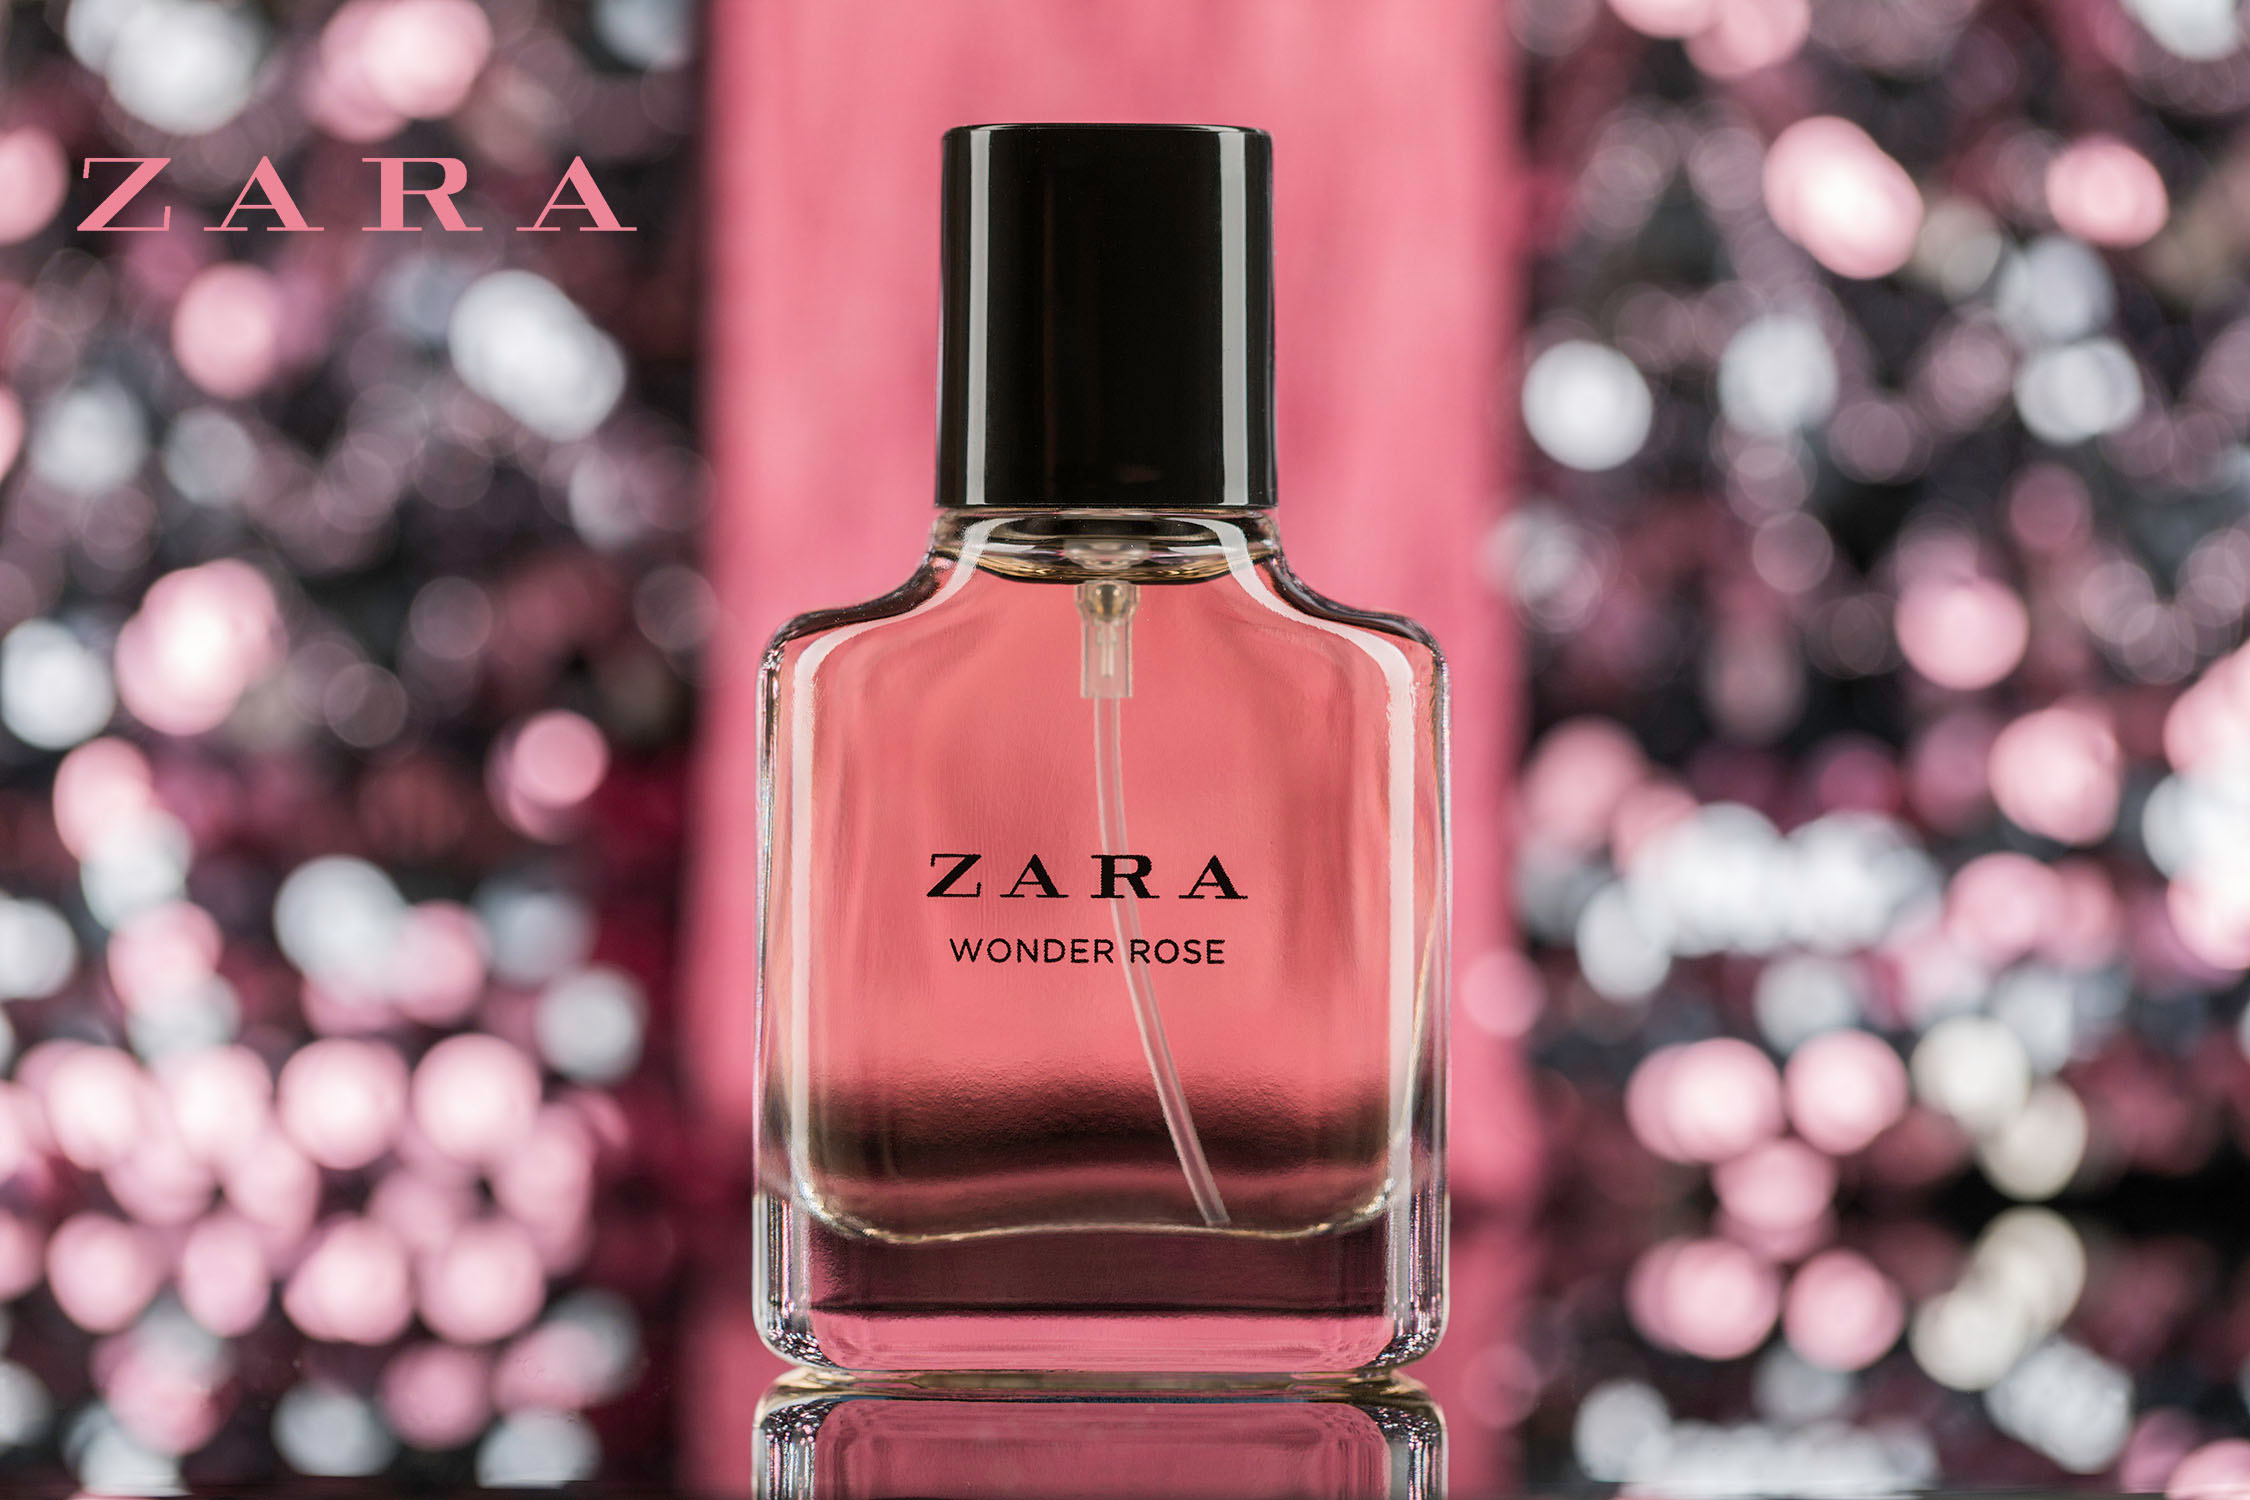 Commercial photography of Zara Wonder Rose by Loesje Kessels Fashion Photographer Dubai